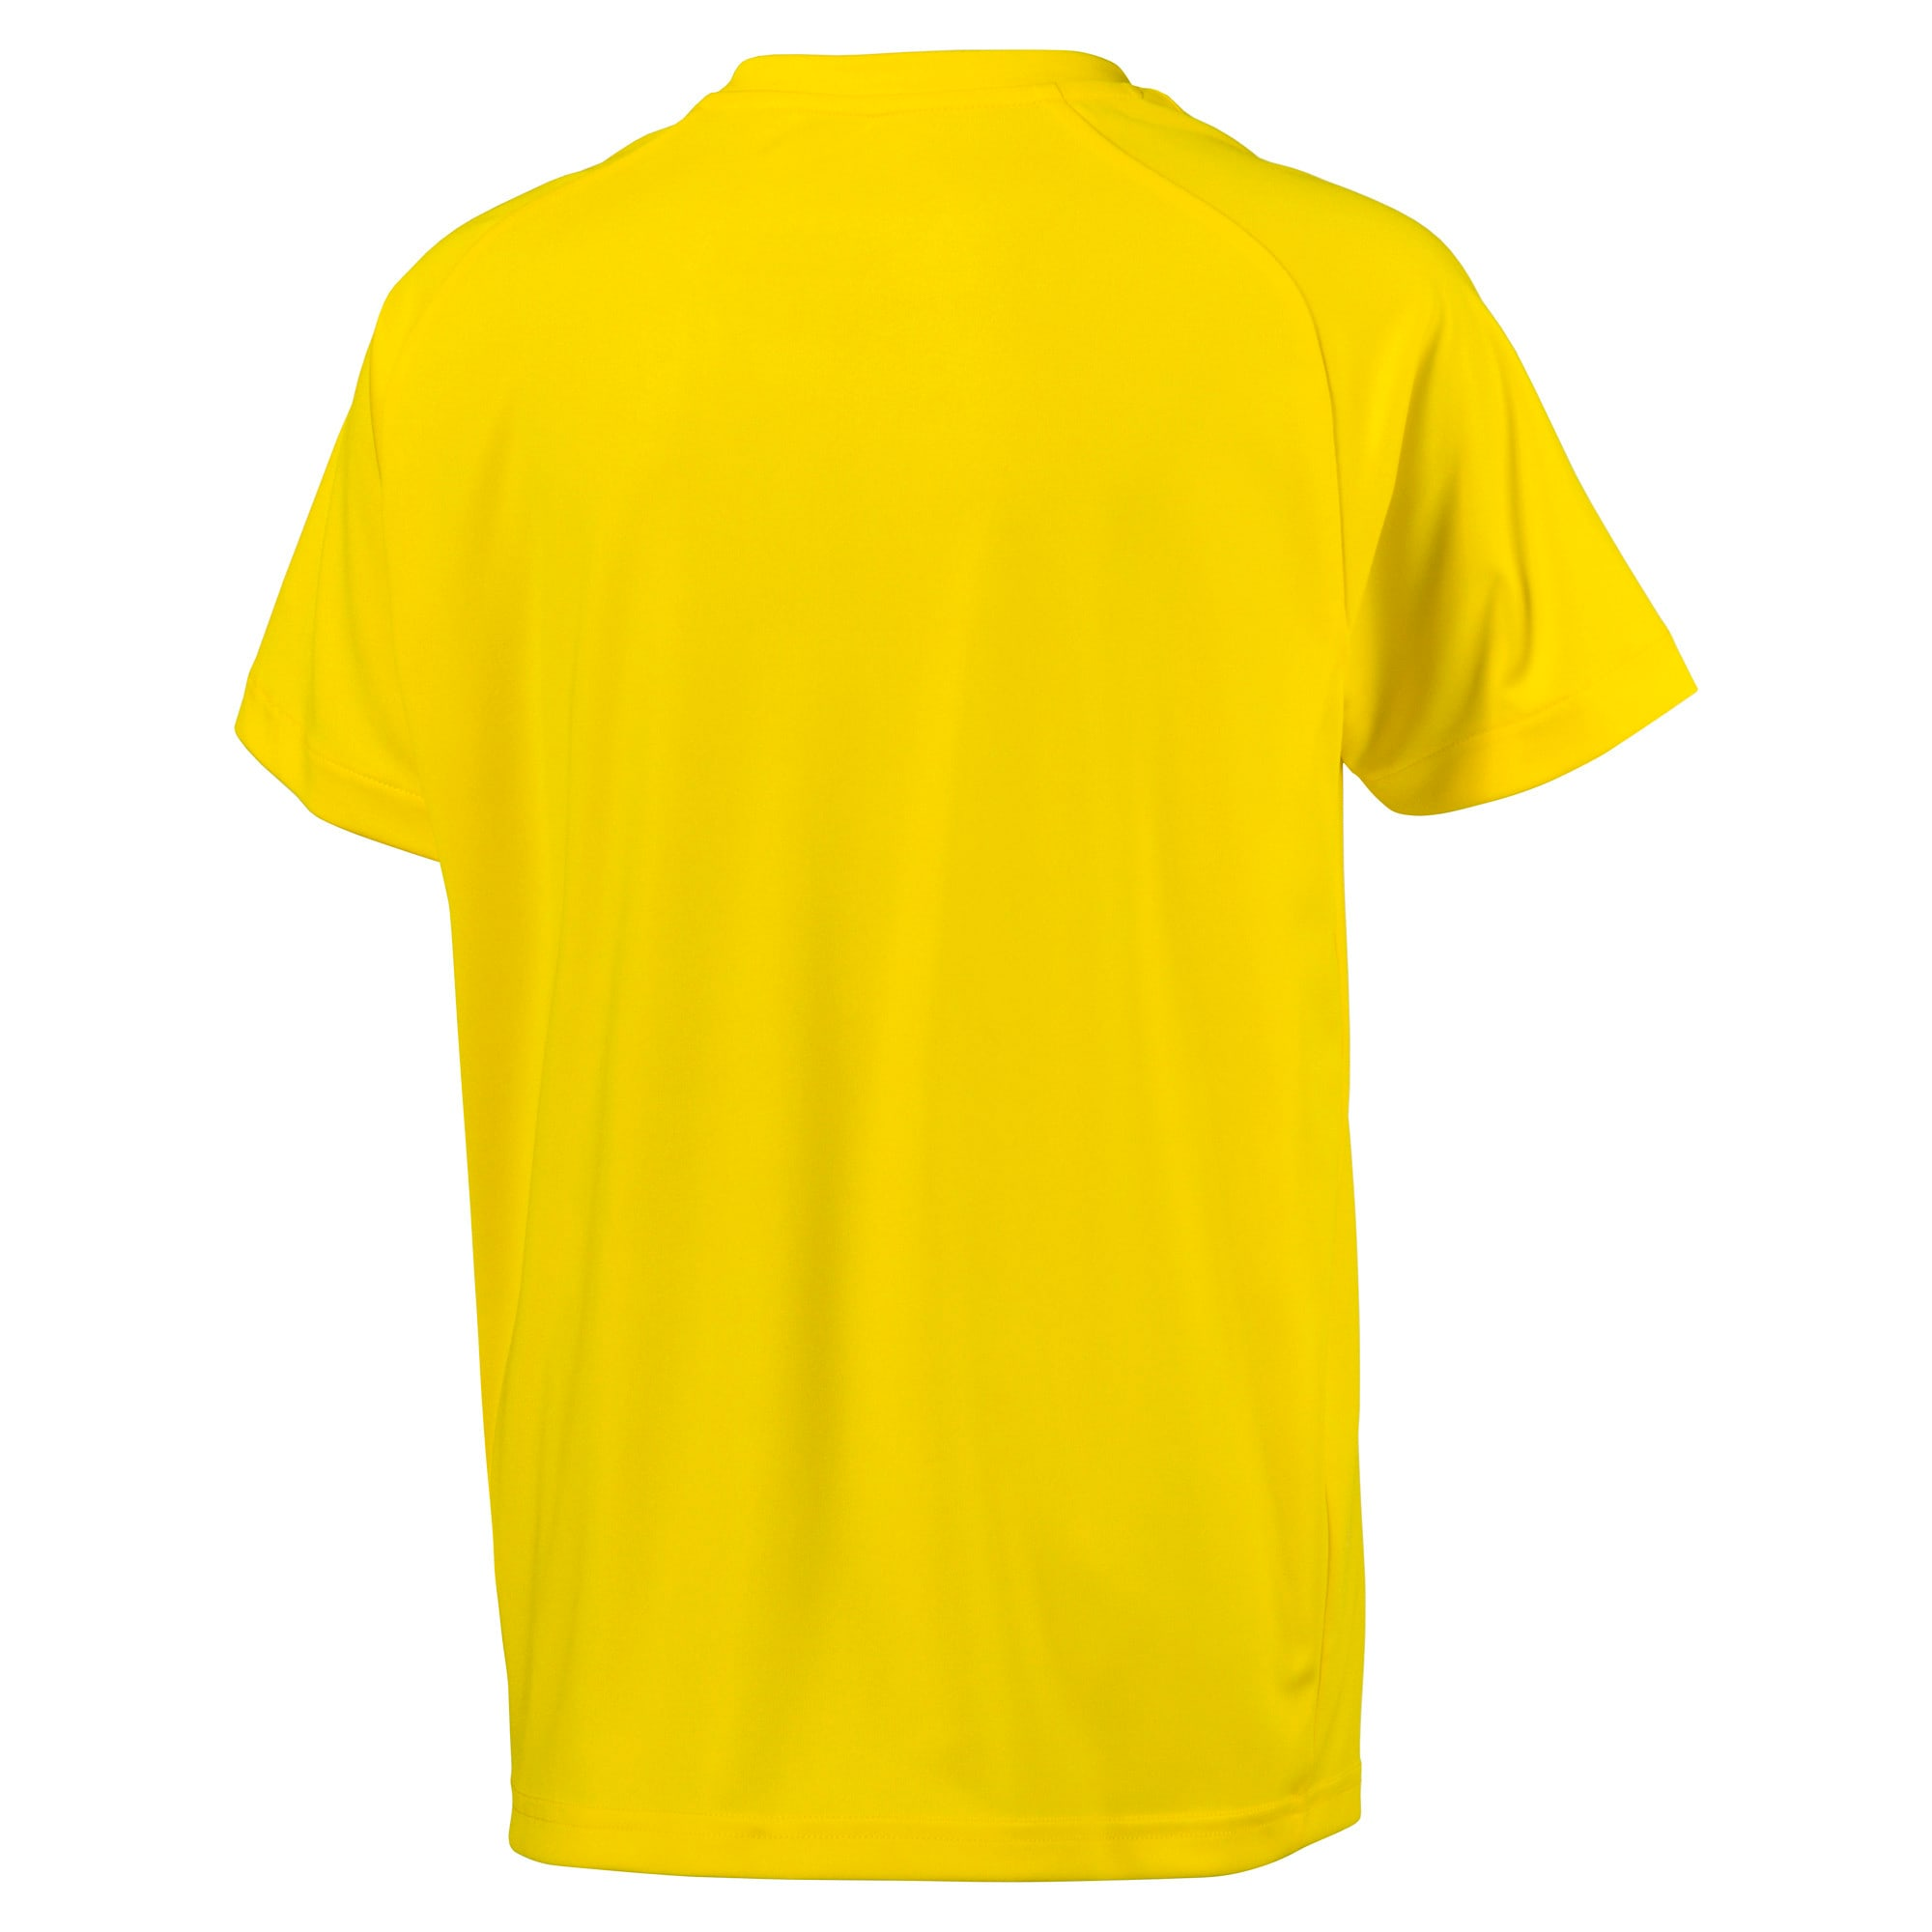 Thumbnail 2 of Fußball Kinder LIGA Core Trikot, Cyber Yellow-Puma Black, medium